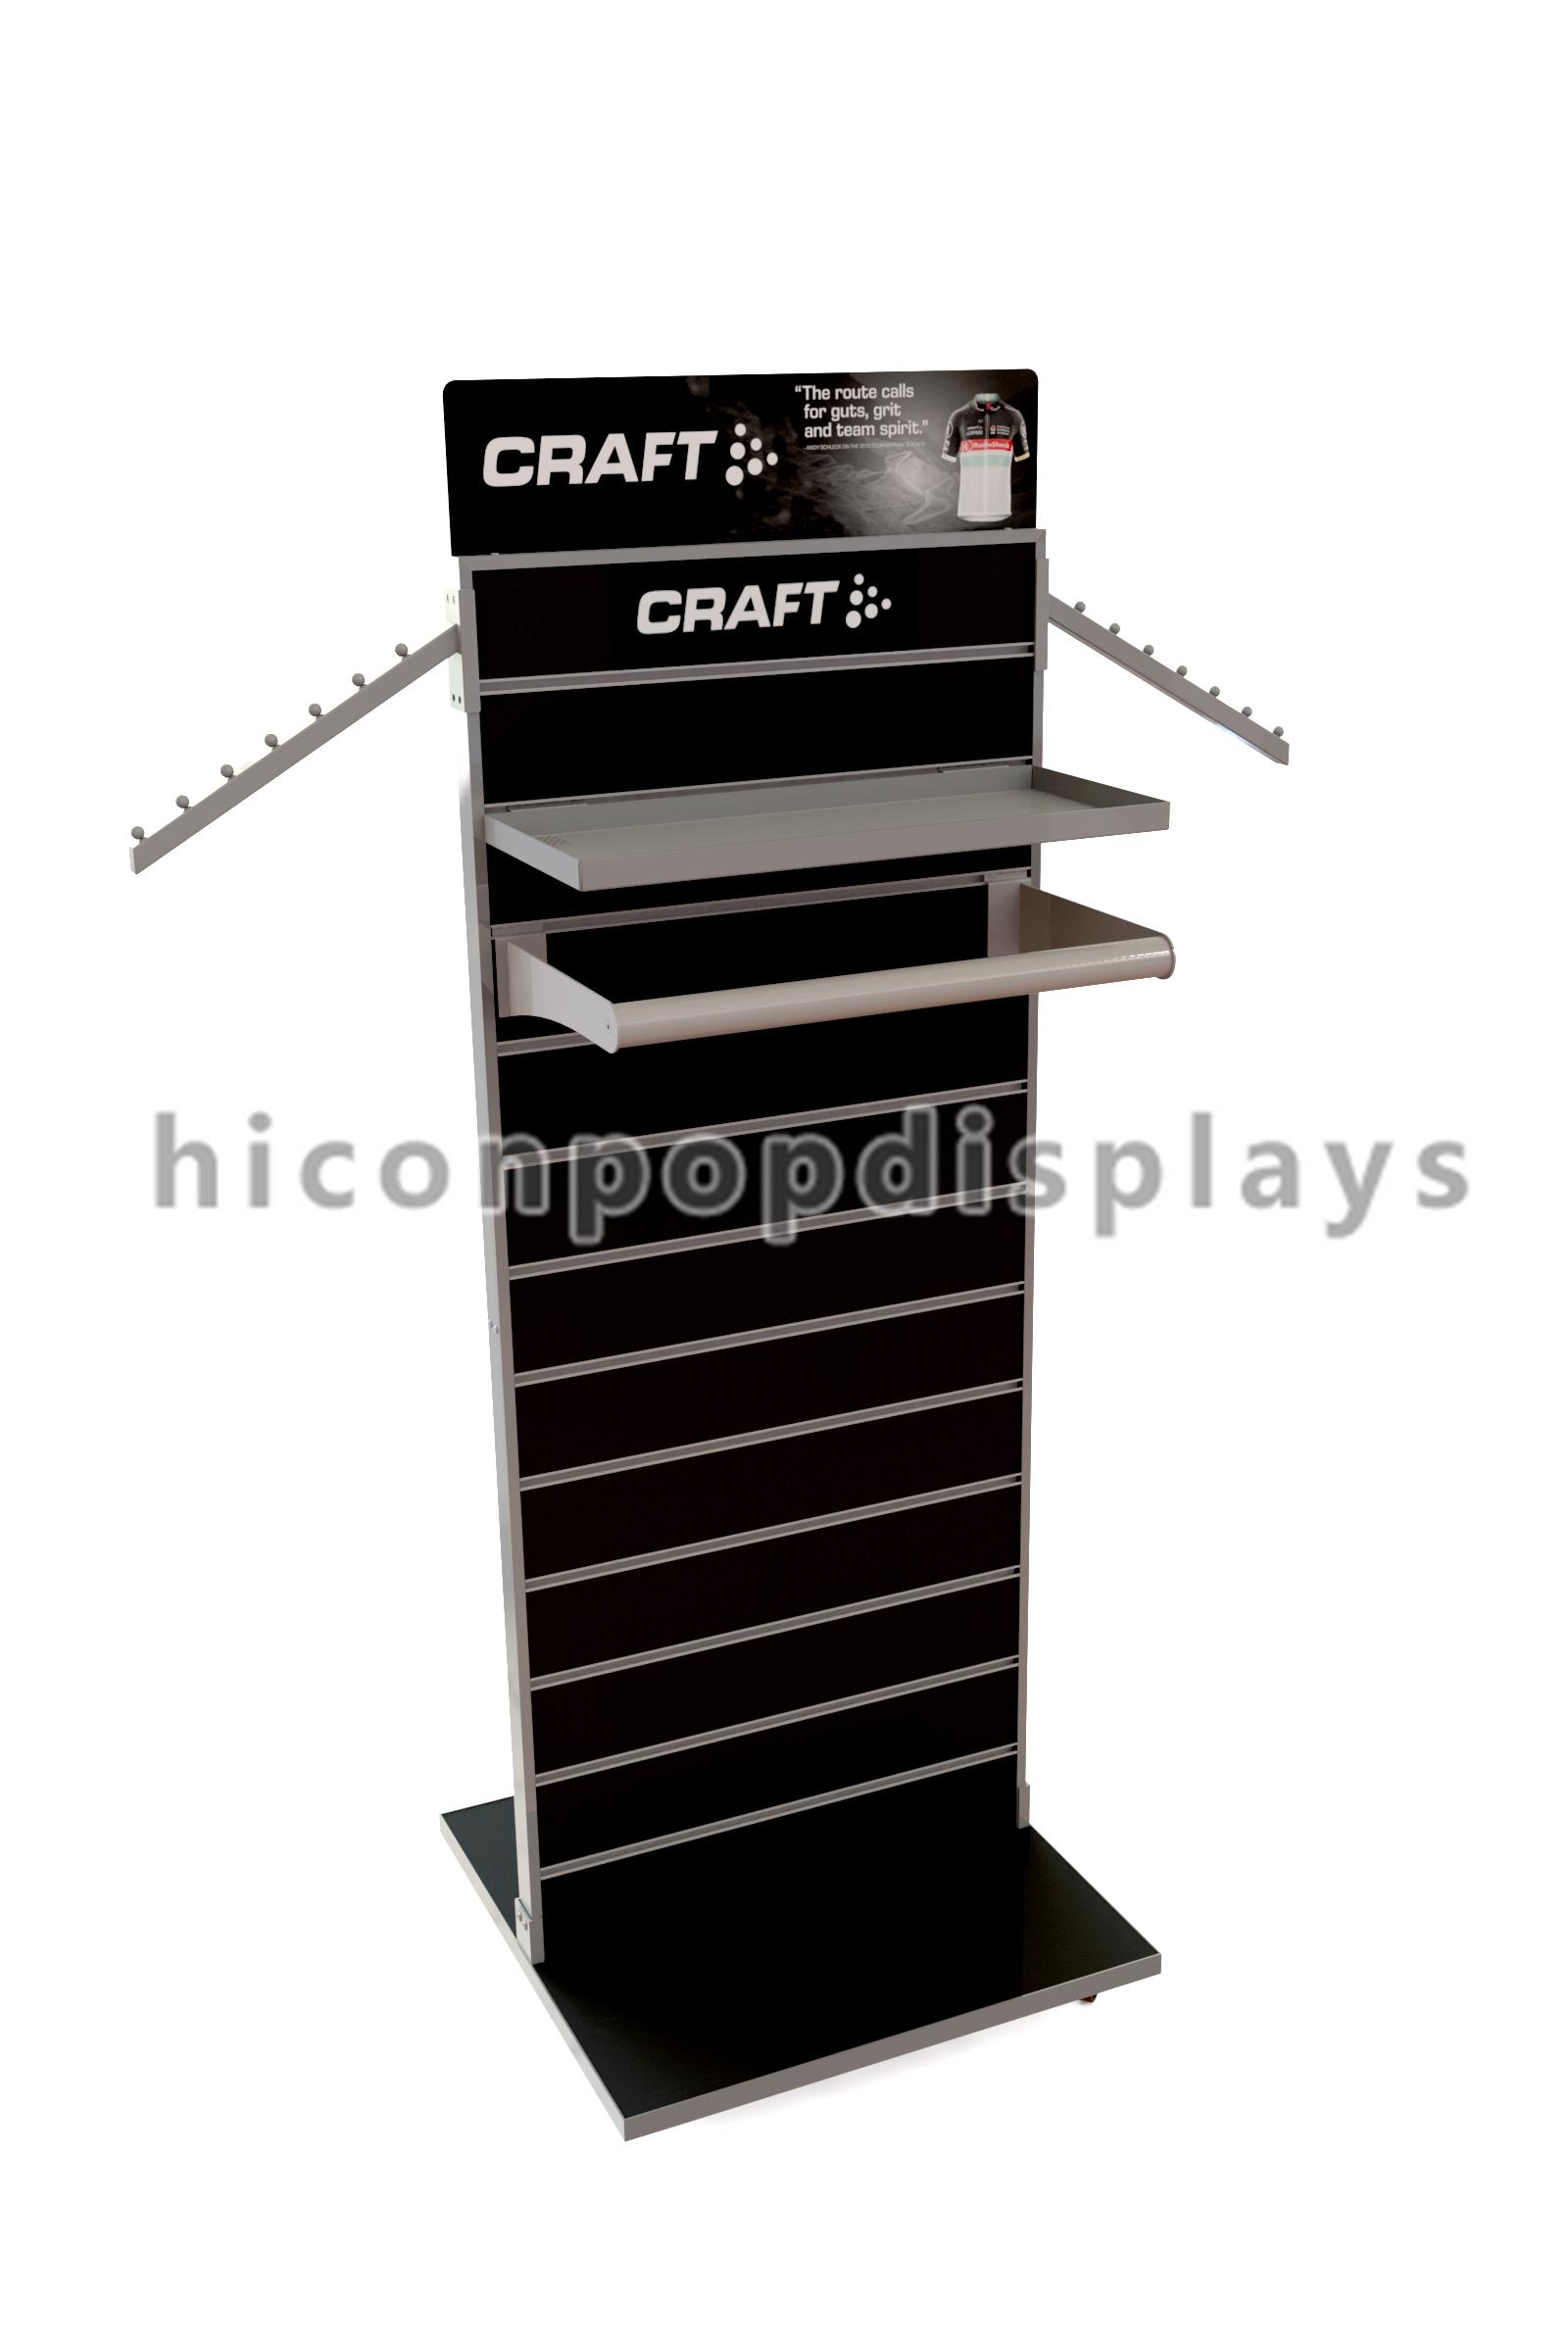 Double Sided Slatwall Display Stands / Slatwall Floor